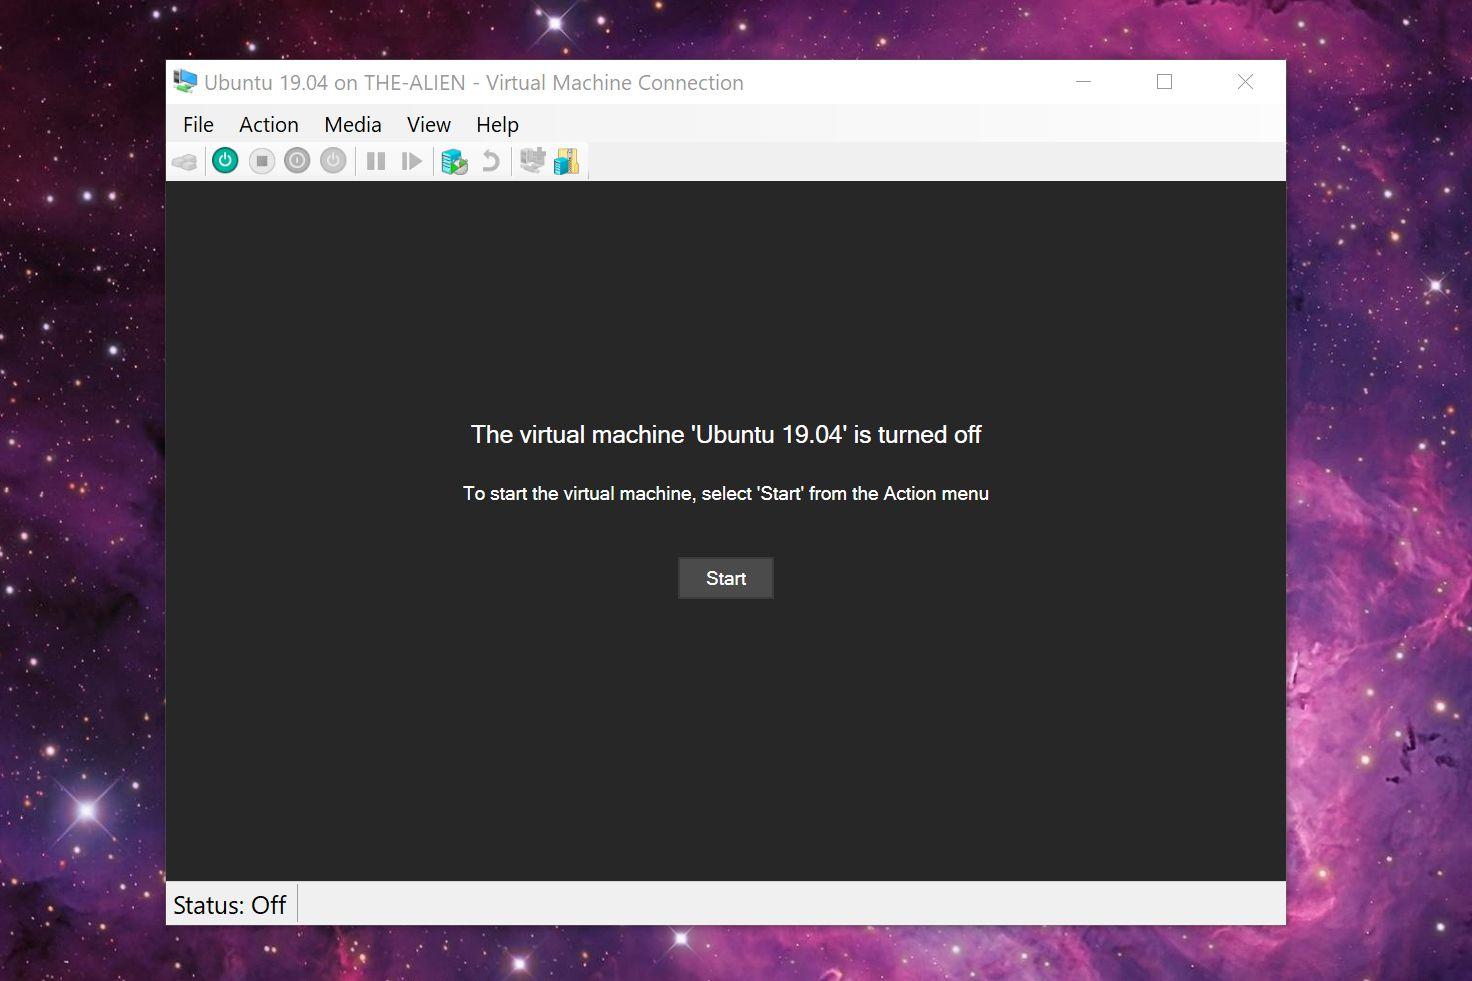 Launch Ubuntu Virtual Machine with Hyper-V